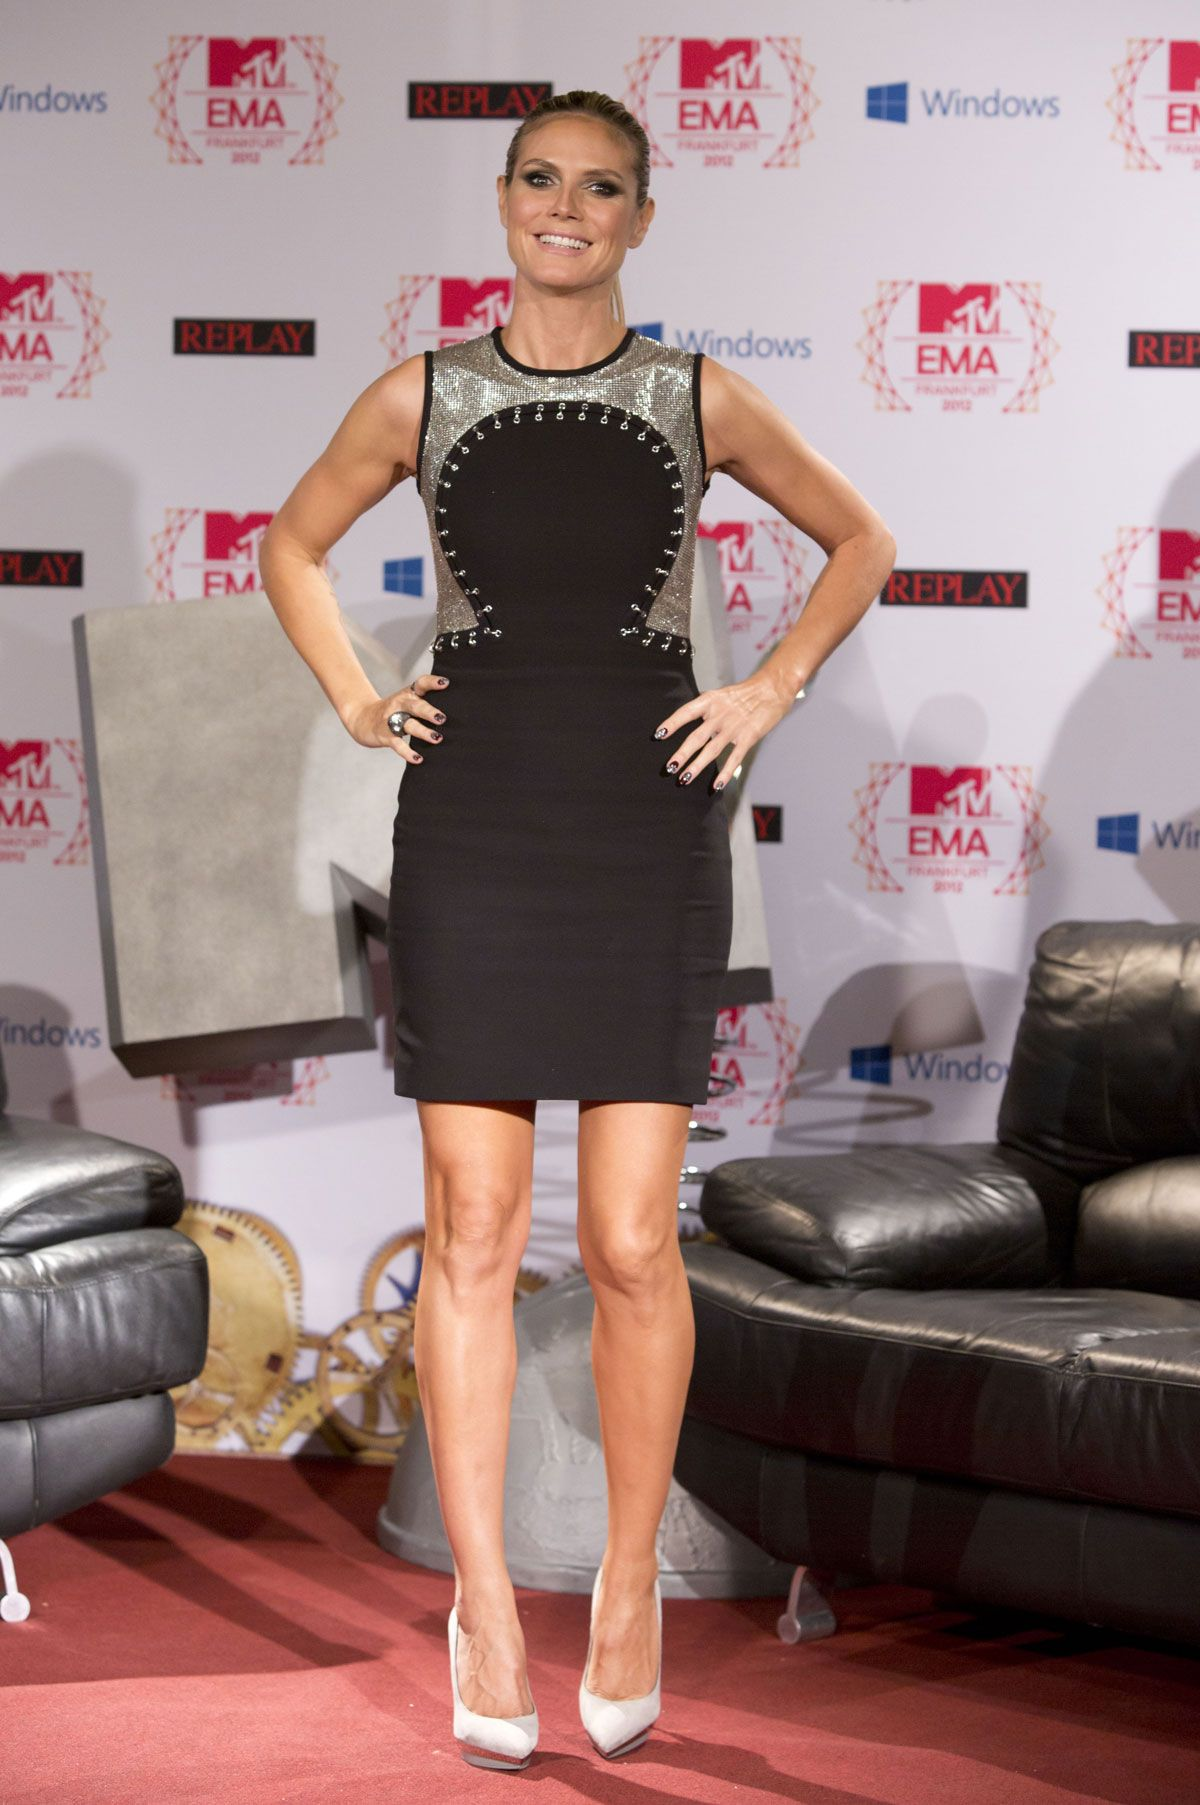 Heidi Klum Mtv European Music Awards  Photocall In Frankfurt